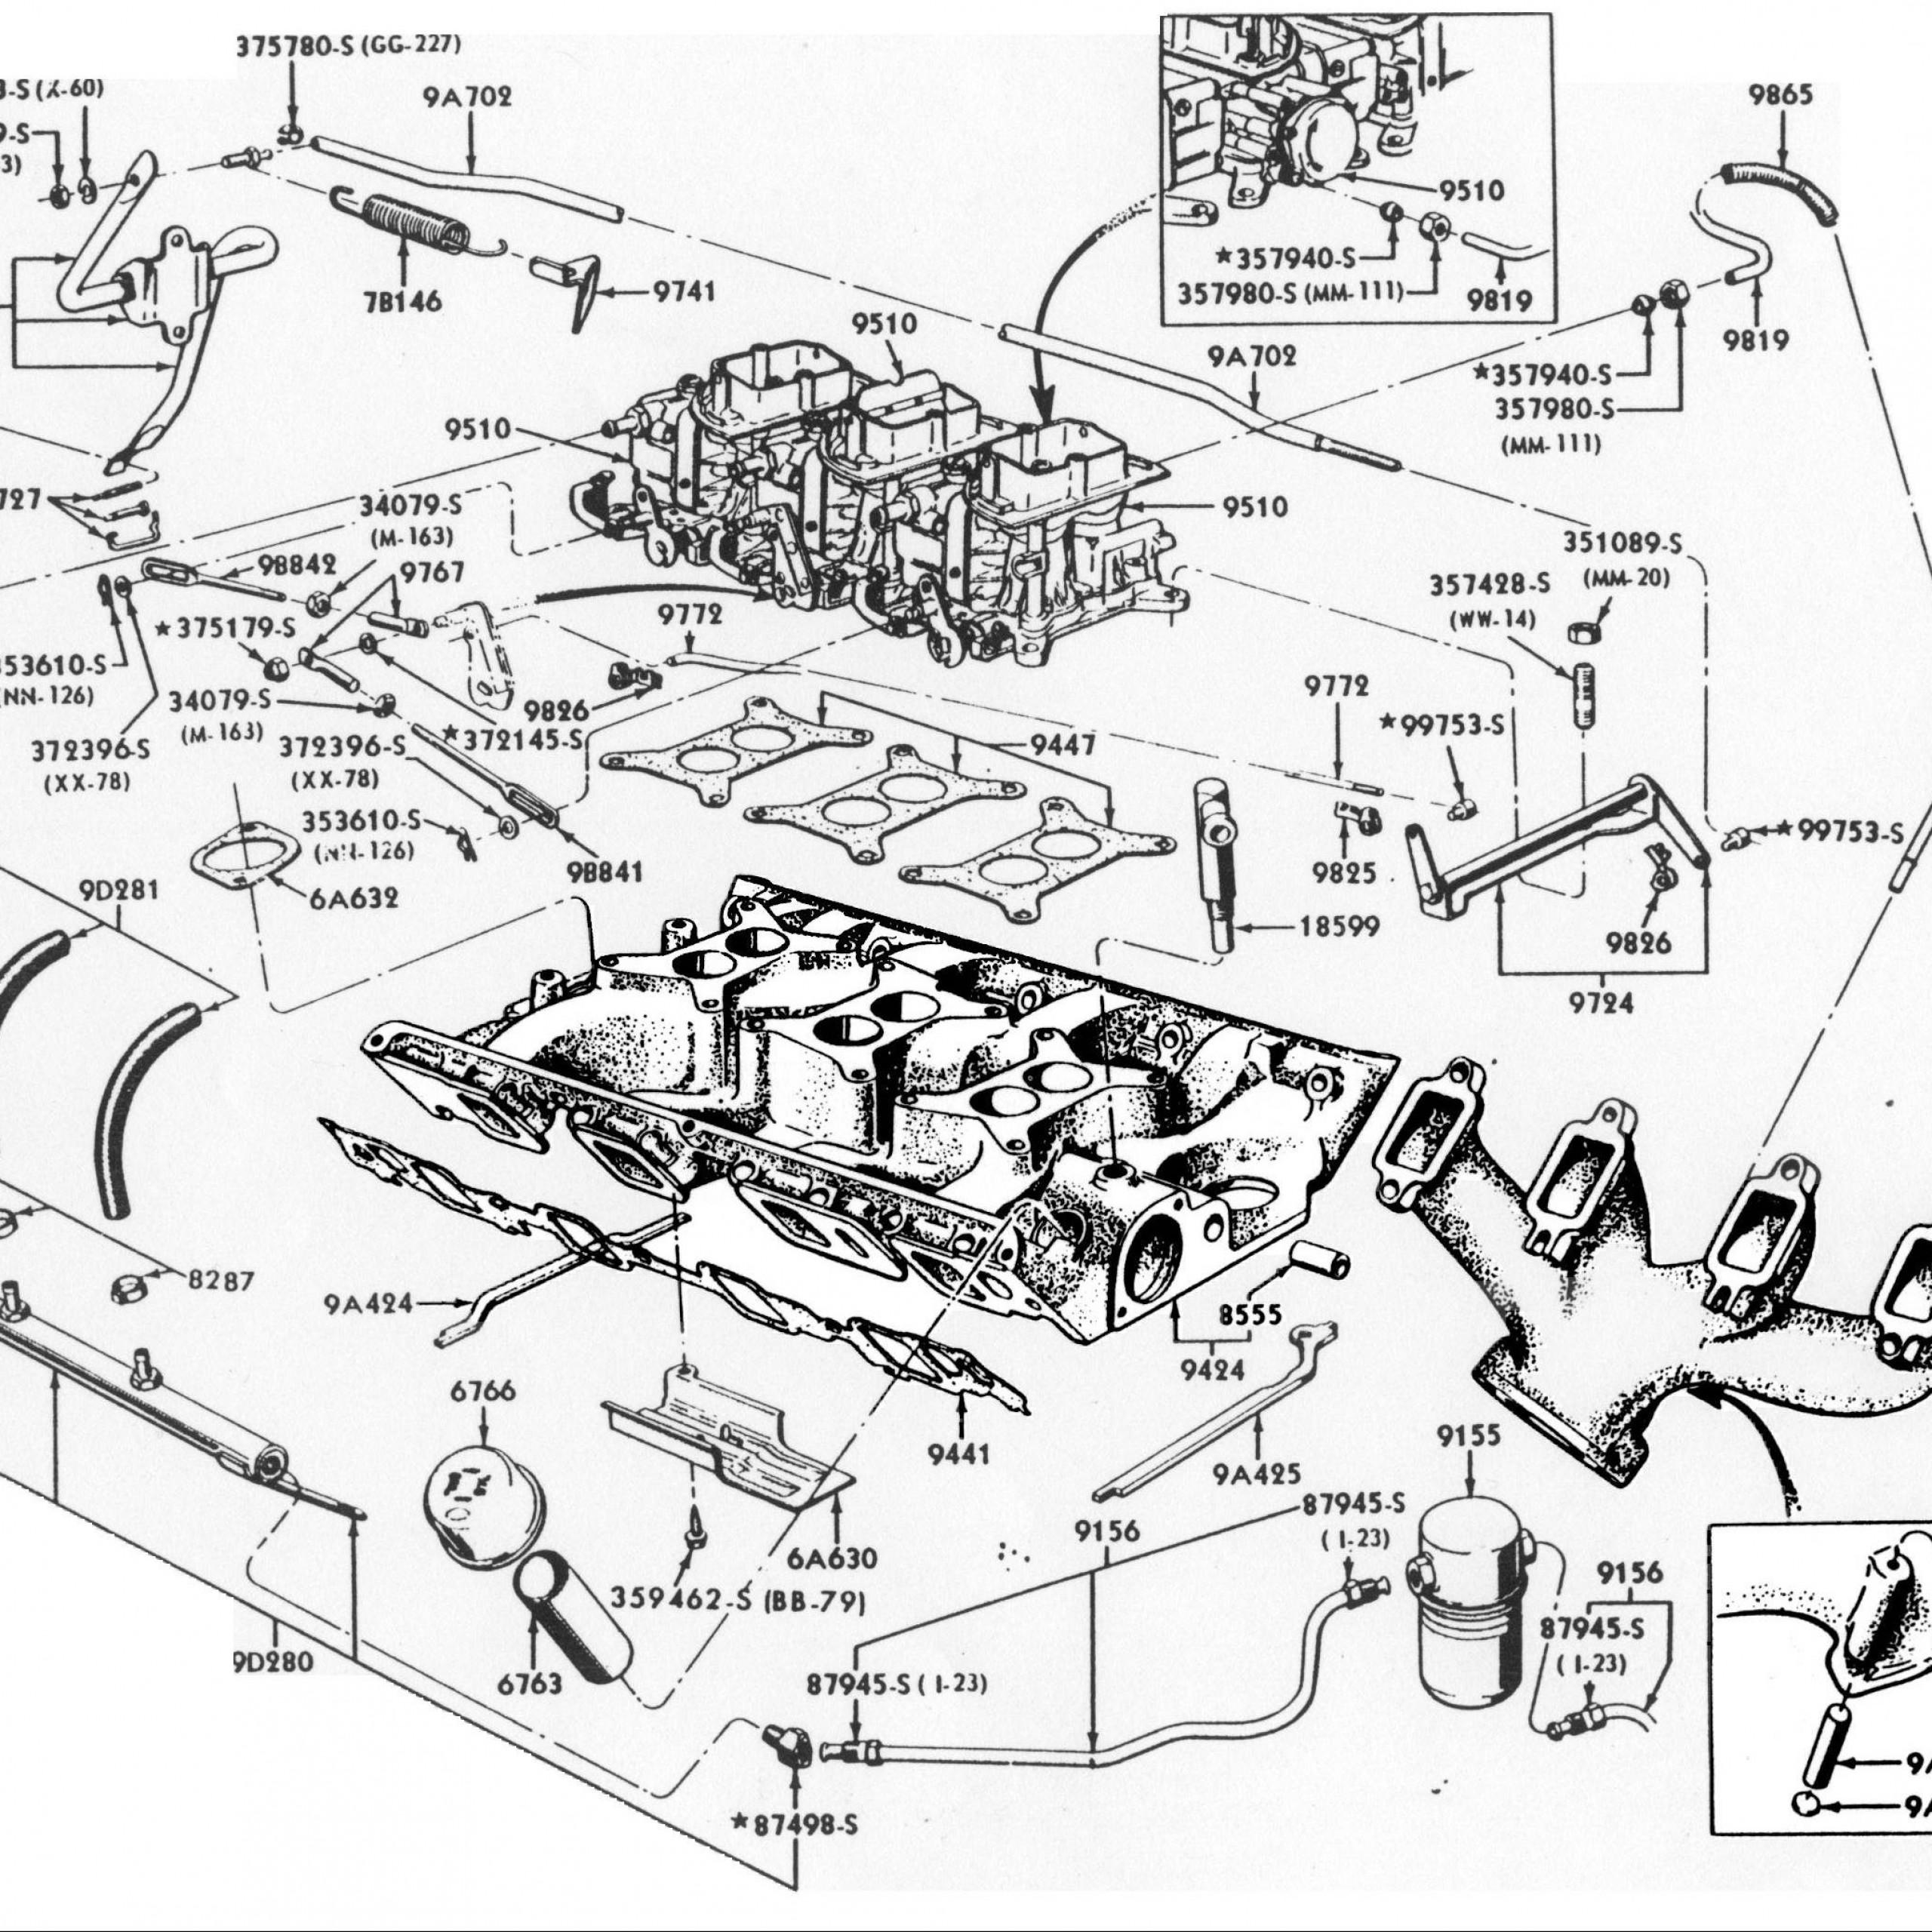 Diagram] 1997 Ford 460 Engine Diagram Full Version Hd